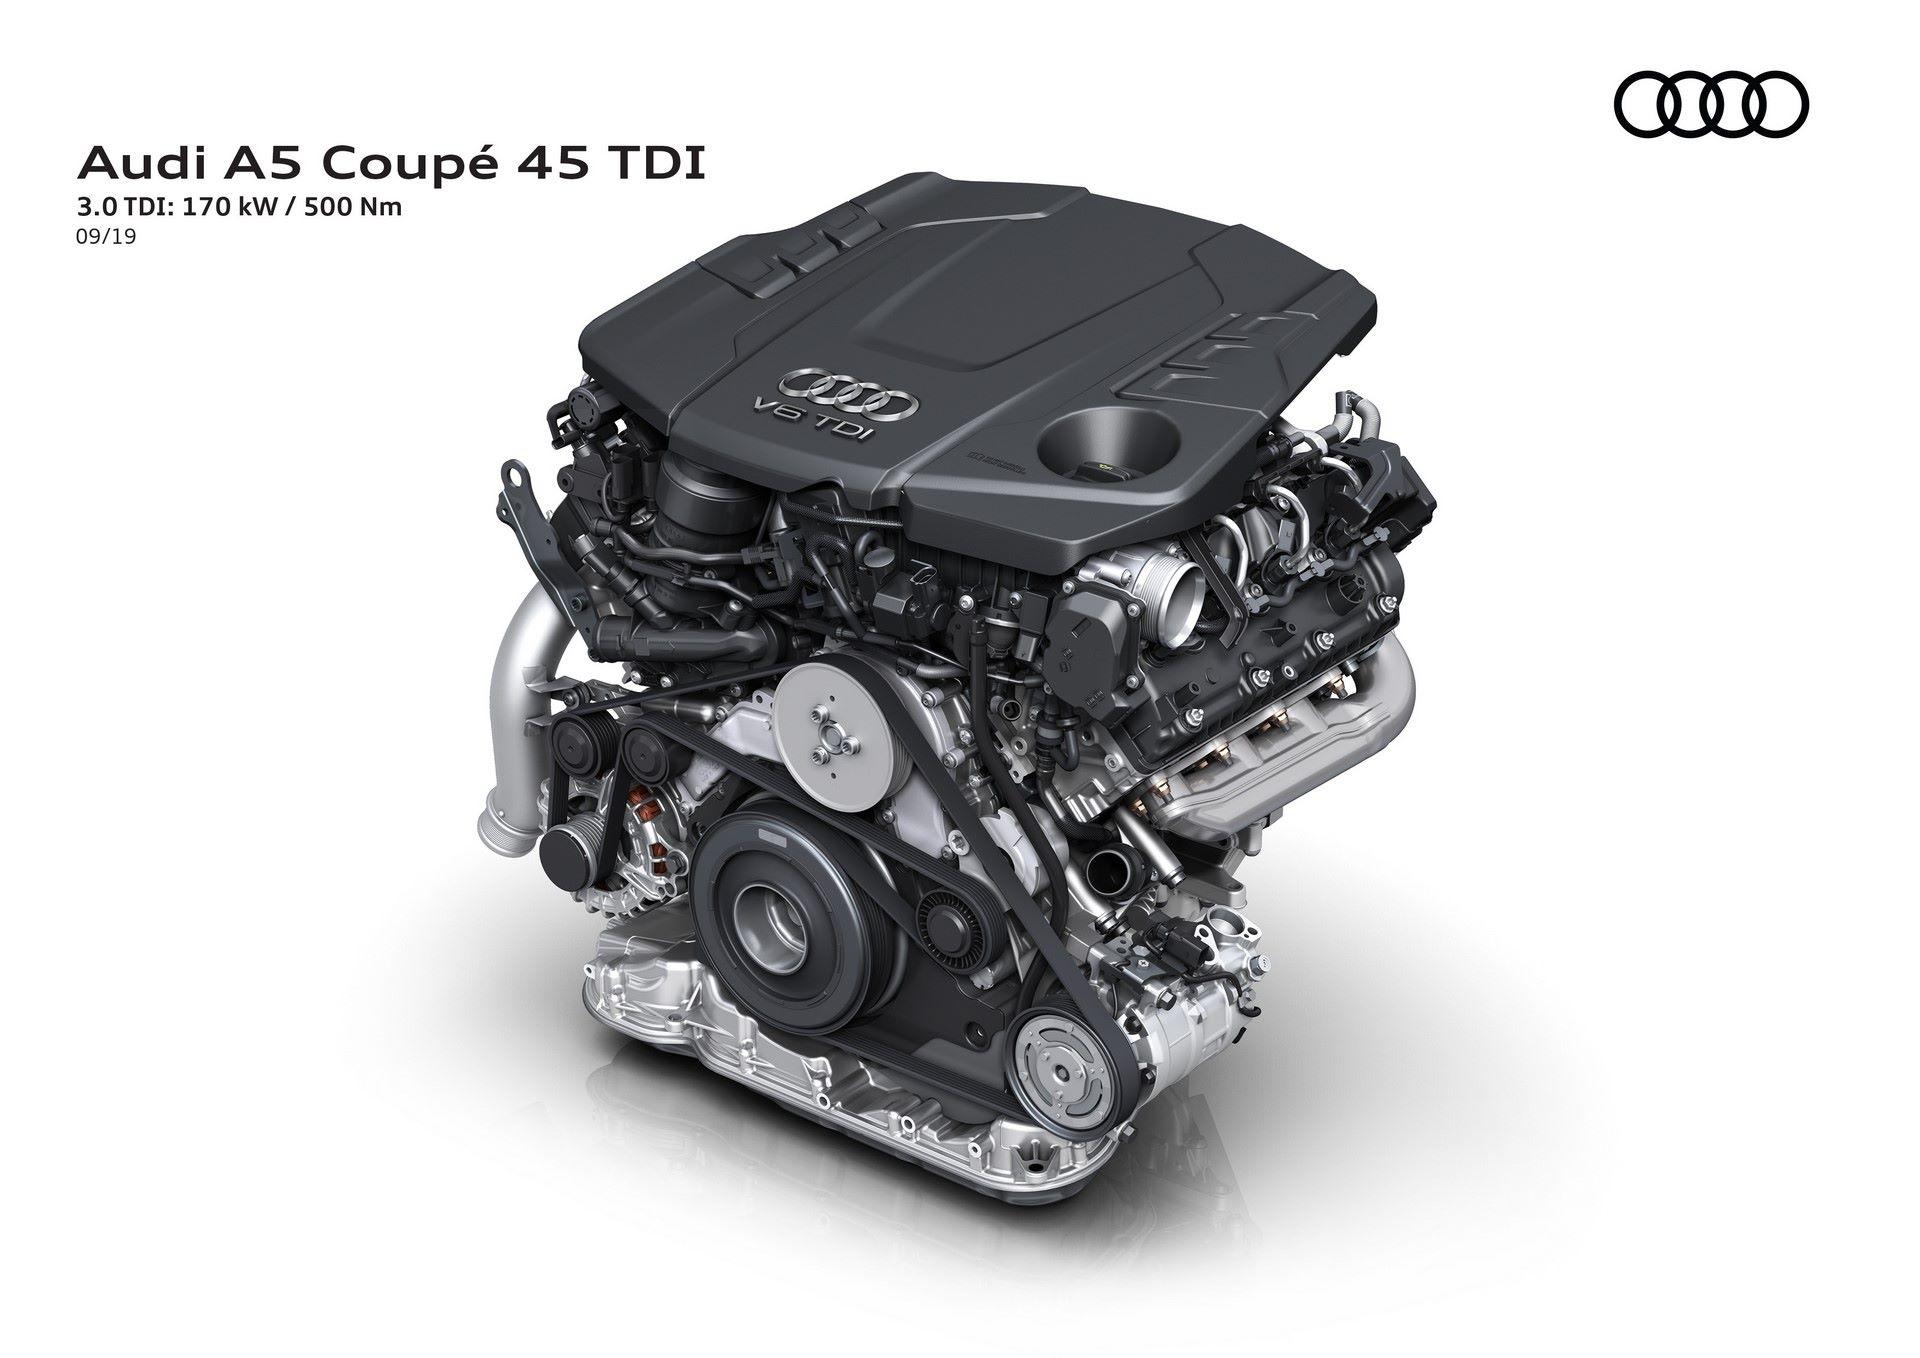 Audi A5 Coupé 45 TDI